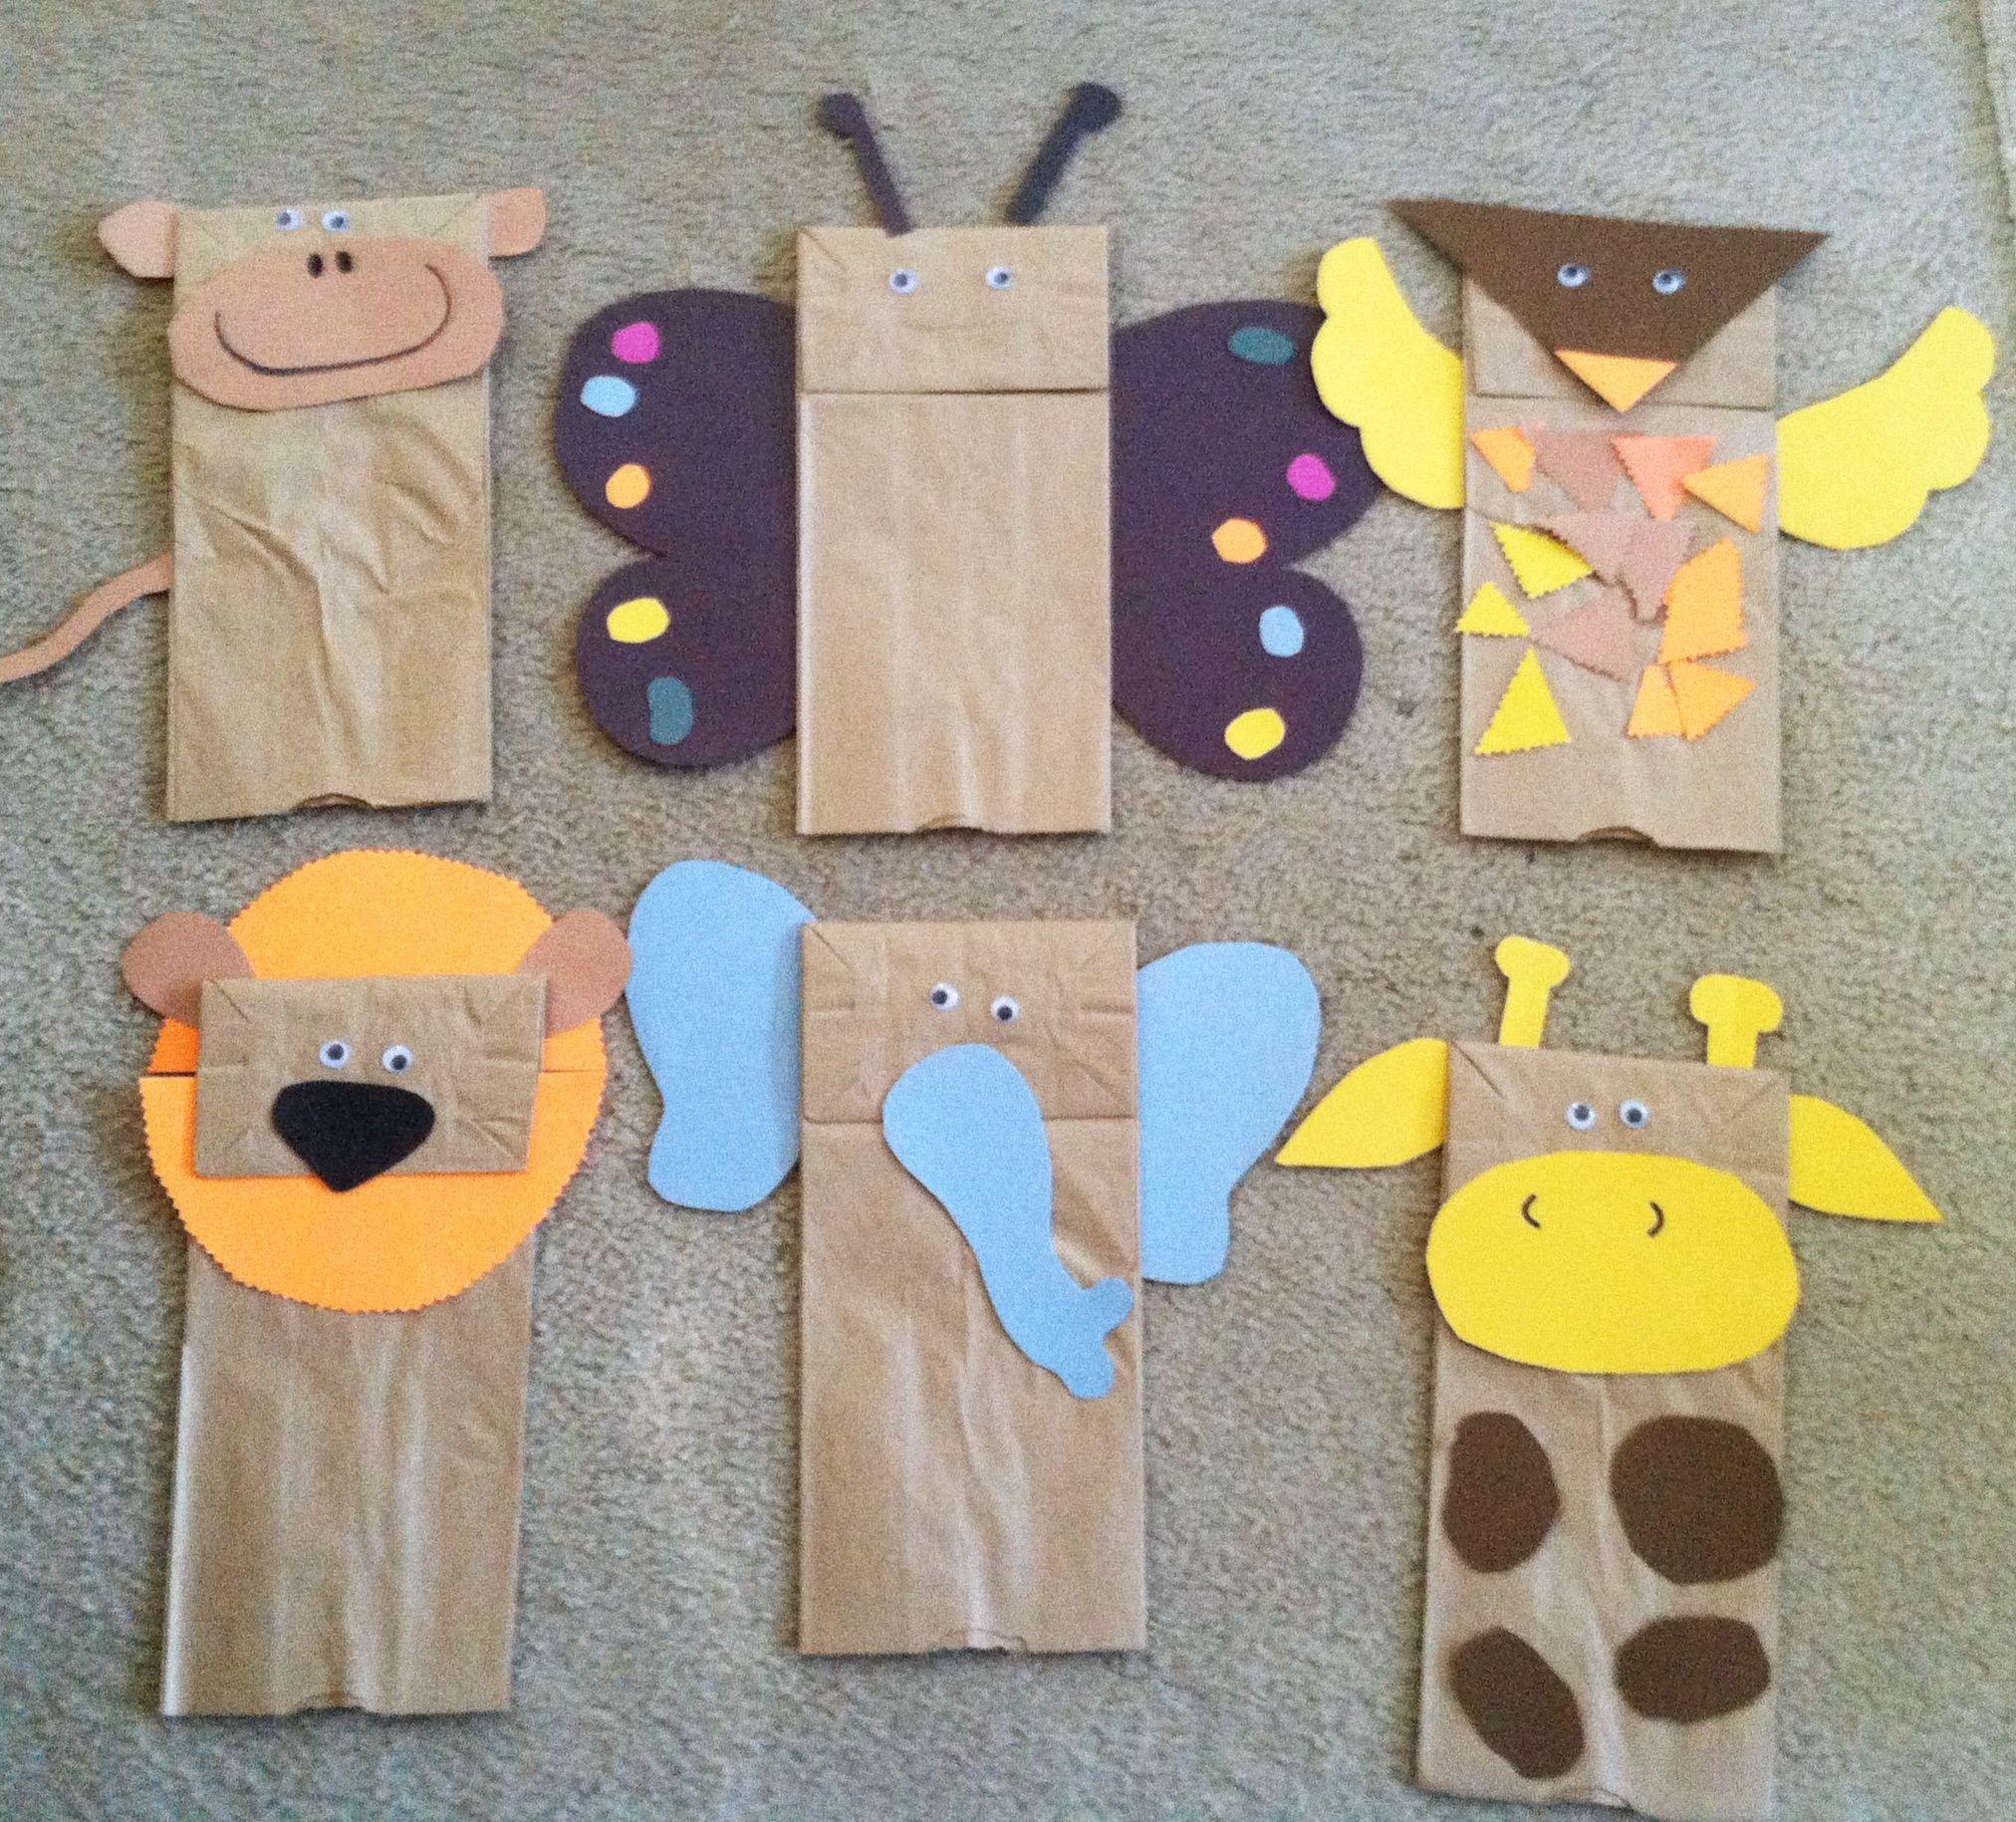 Brown Paper Bag Jungle Animal Puppets W Children S Book Giraffe Can T Dance Should Be Fun